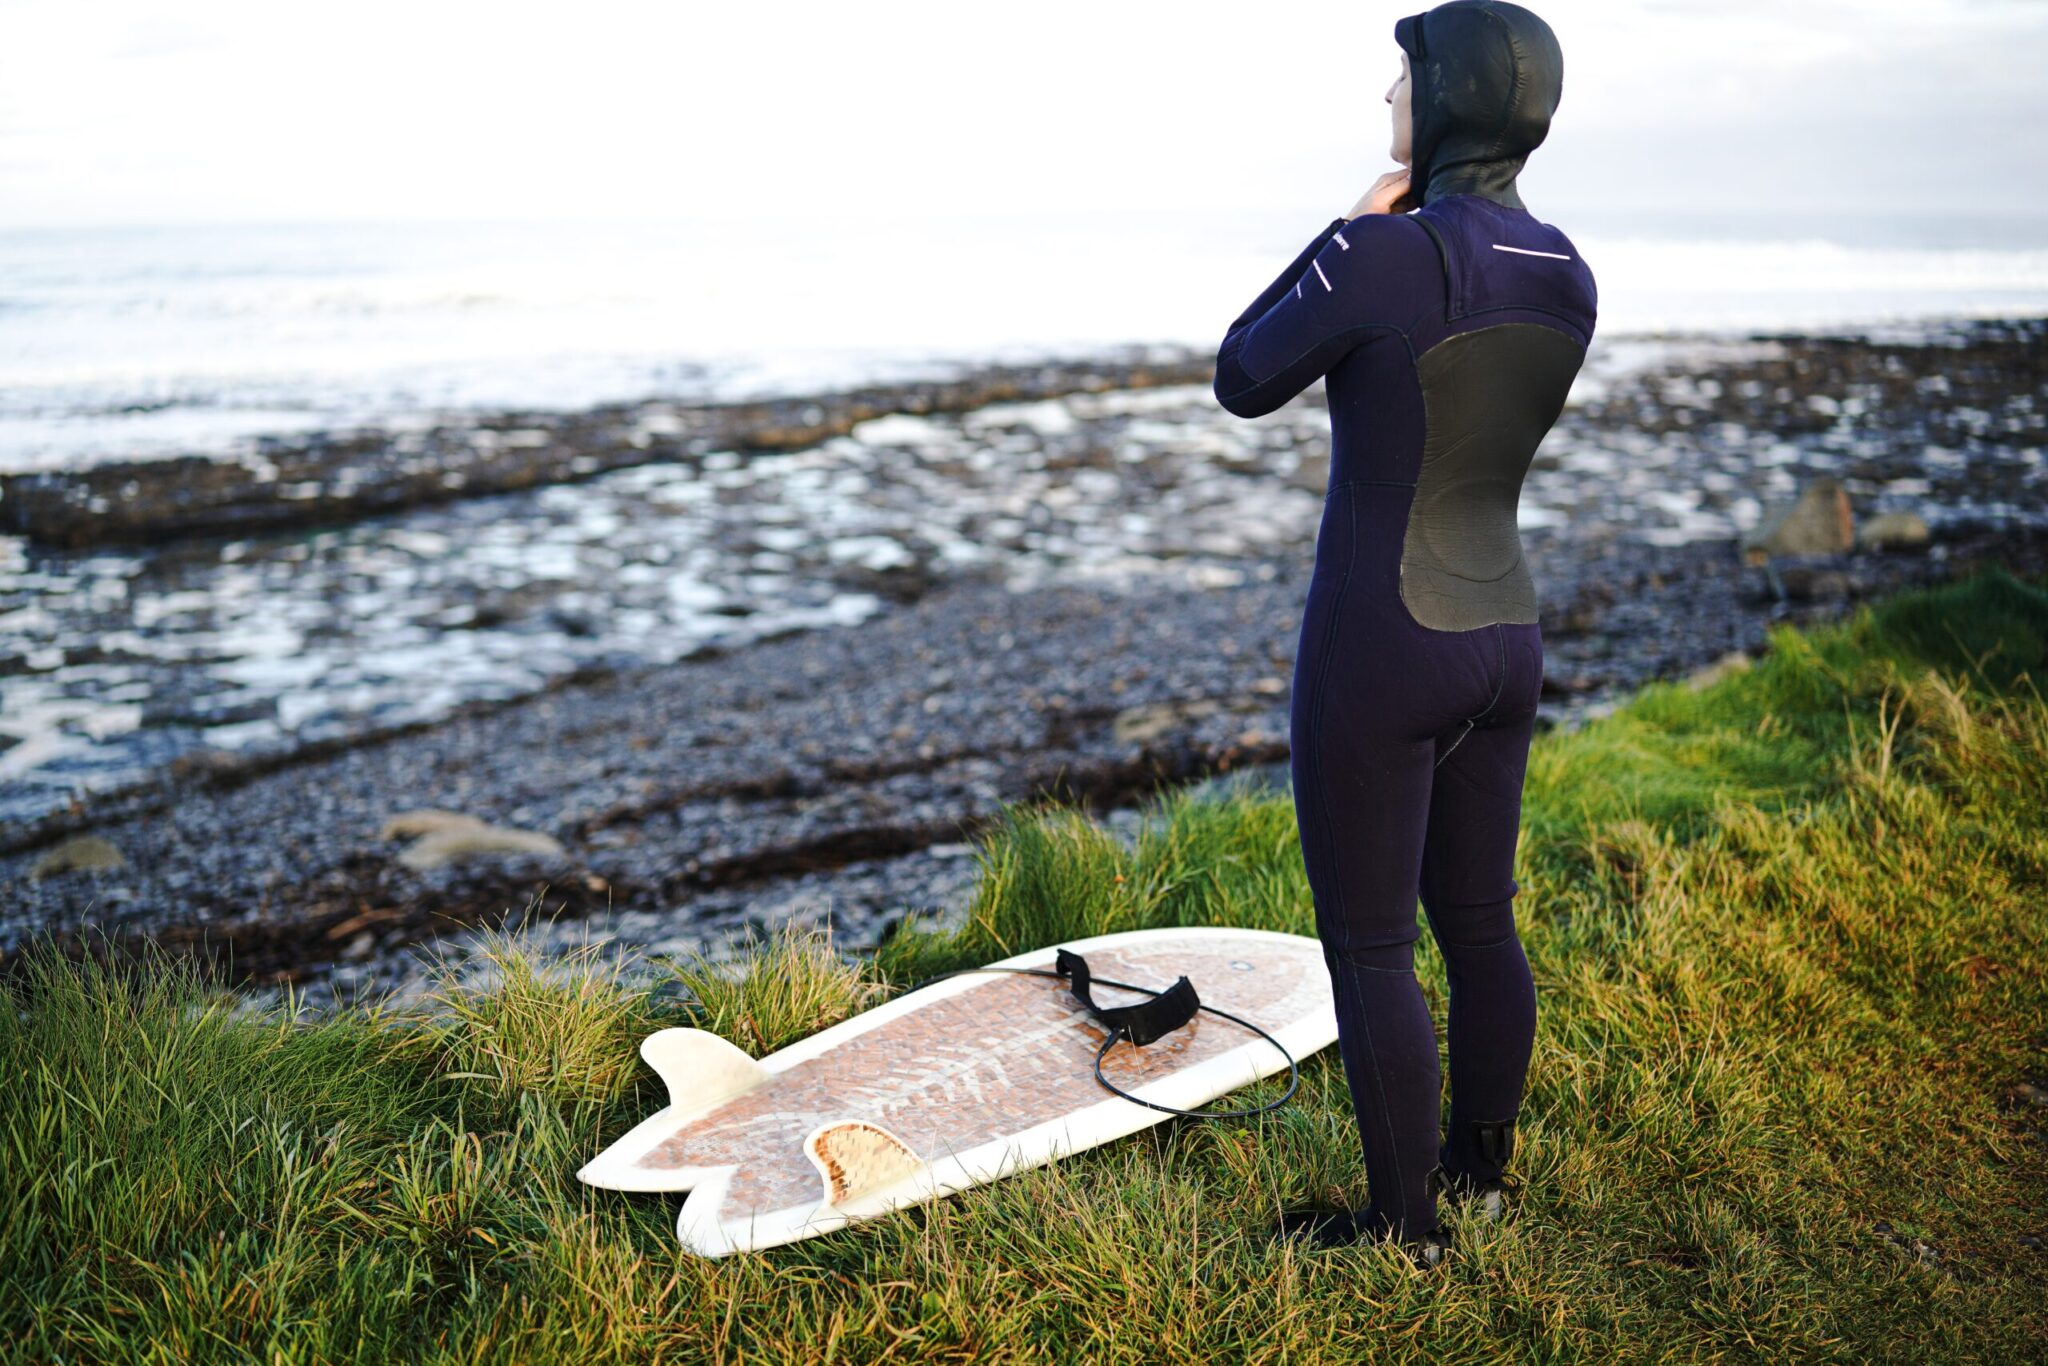 Winter surfing UK